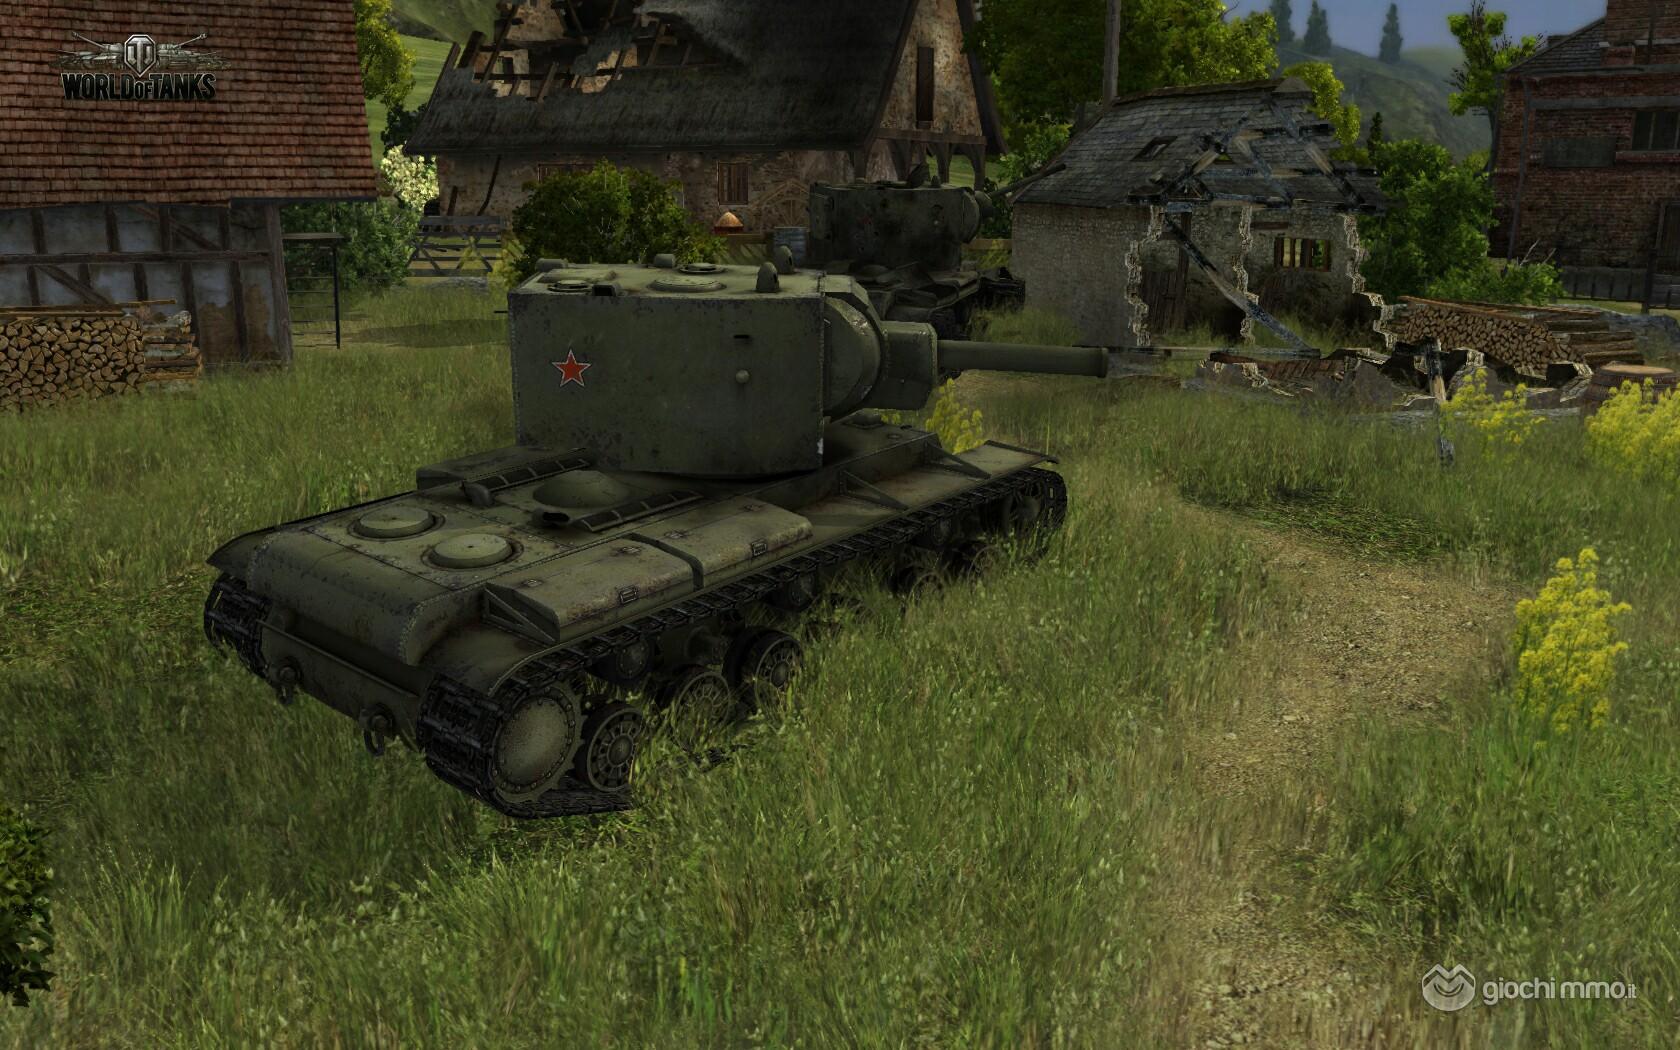 Clicca sull'immagine per ingrandirlaNome:   World of Tanks screen4.jpgVisite: 91Dimensione:   526.7 KBID: 8204